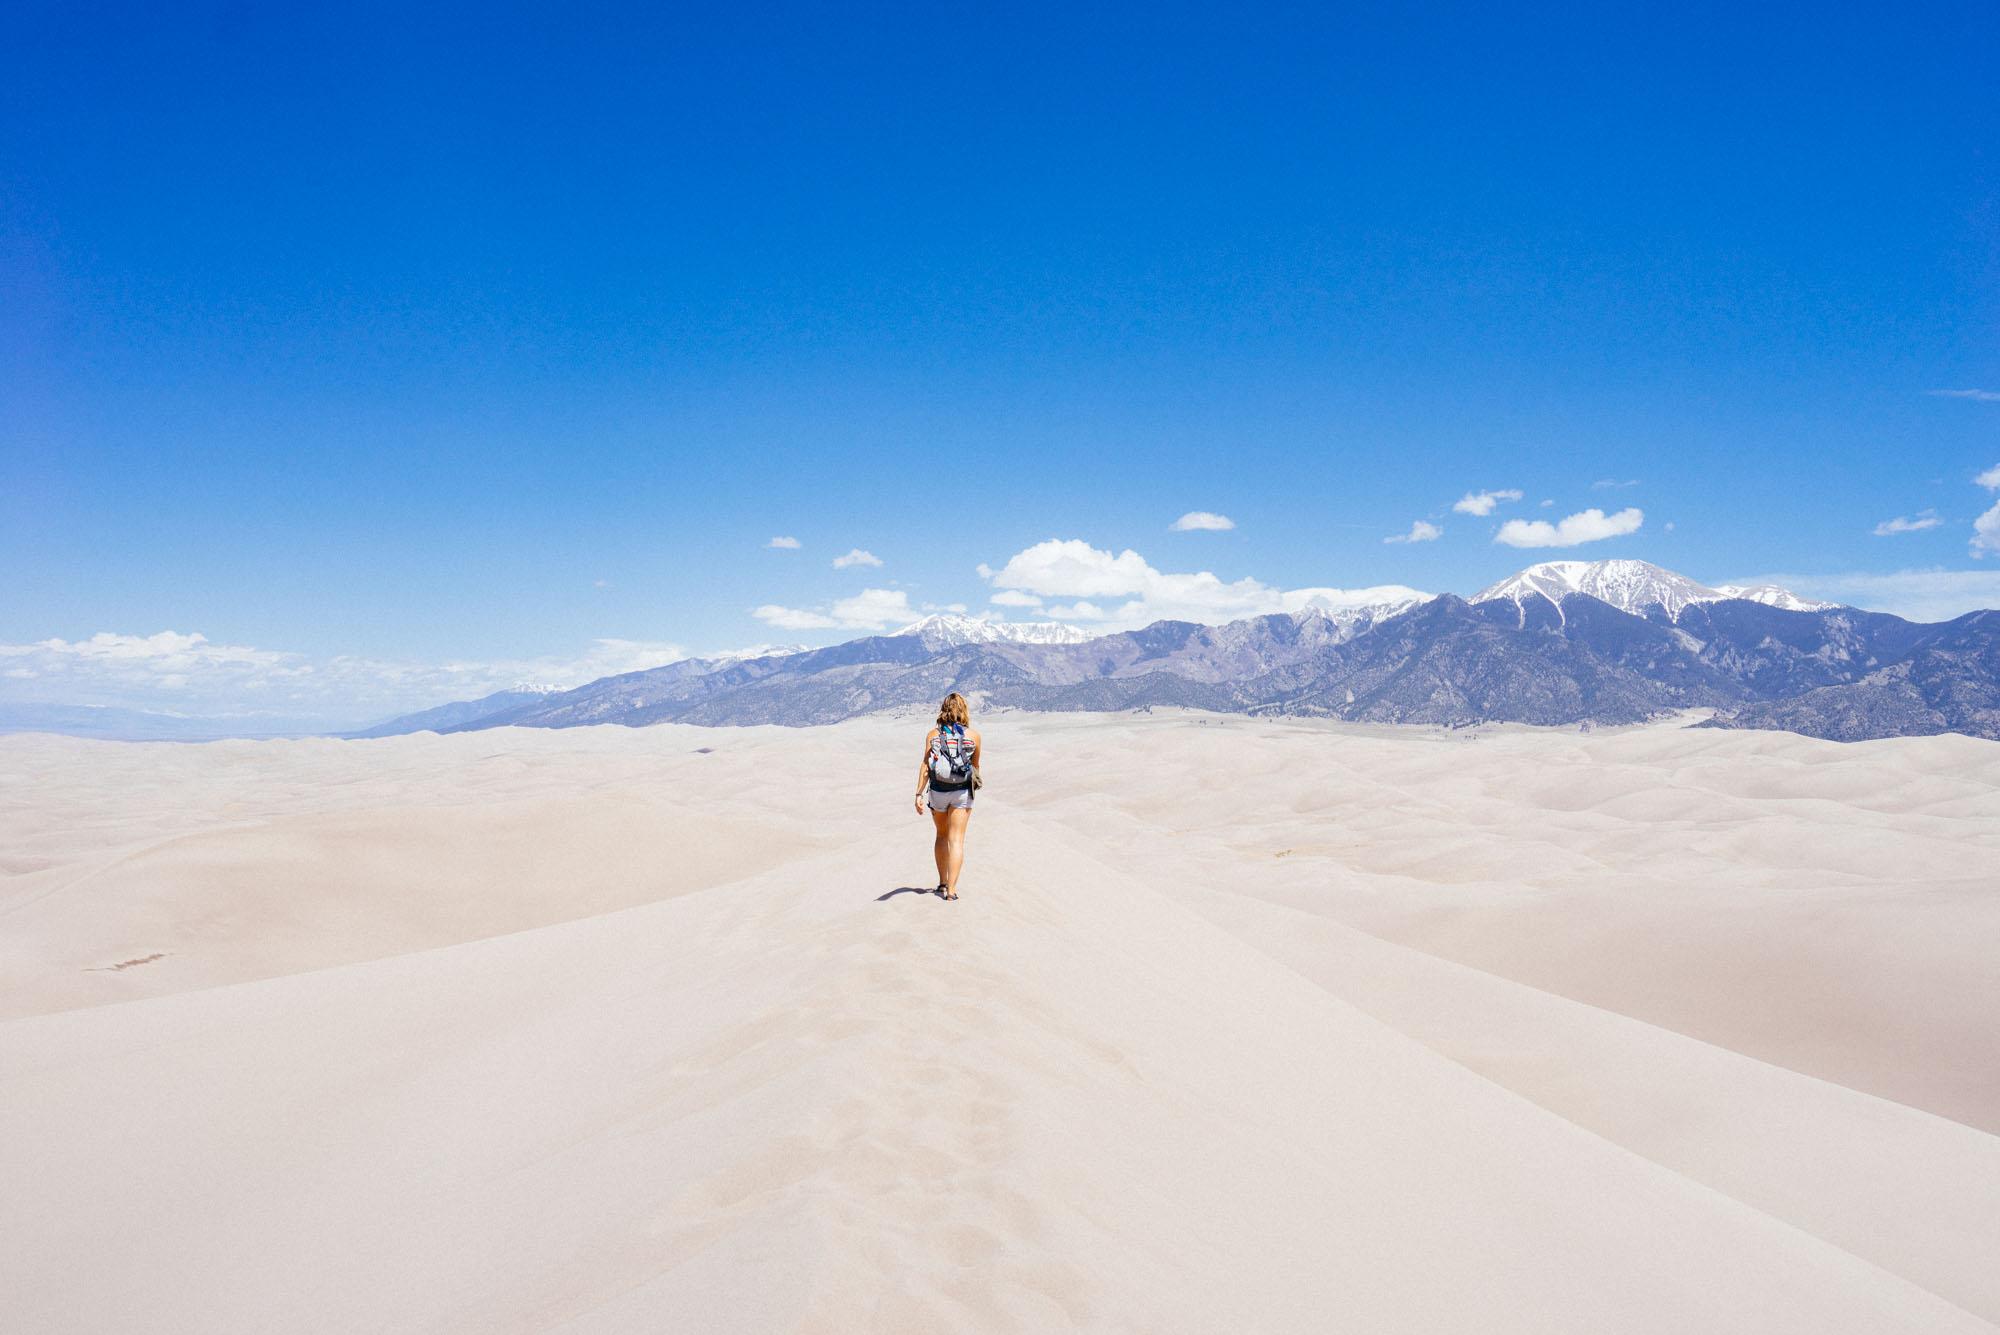 MAK headed into the dunes